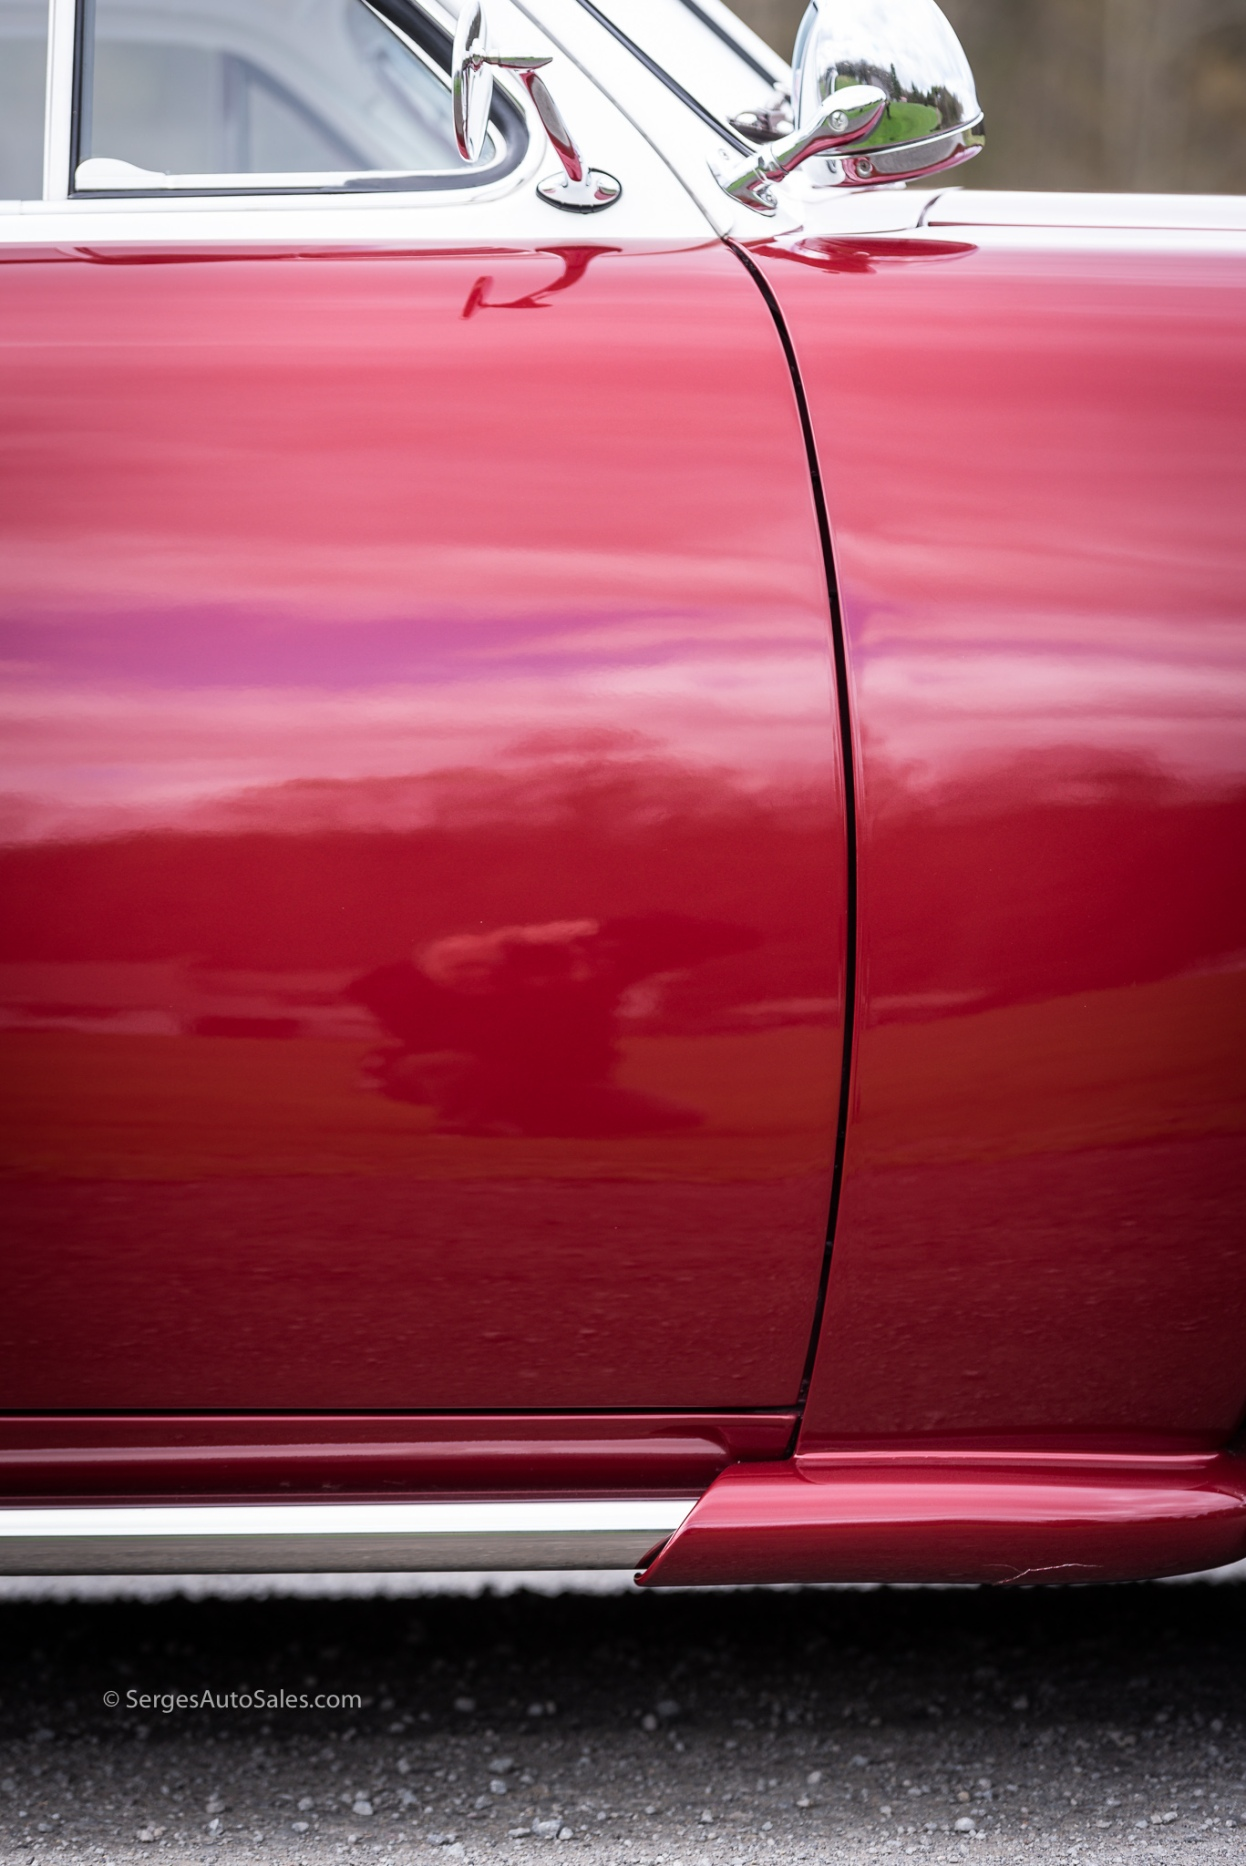 1950-ford-custom-for-sale-serges-auto-sales-pennsylvania-car-dealer-classics-customs-muscle-brokering-46